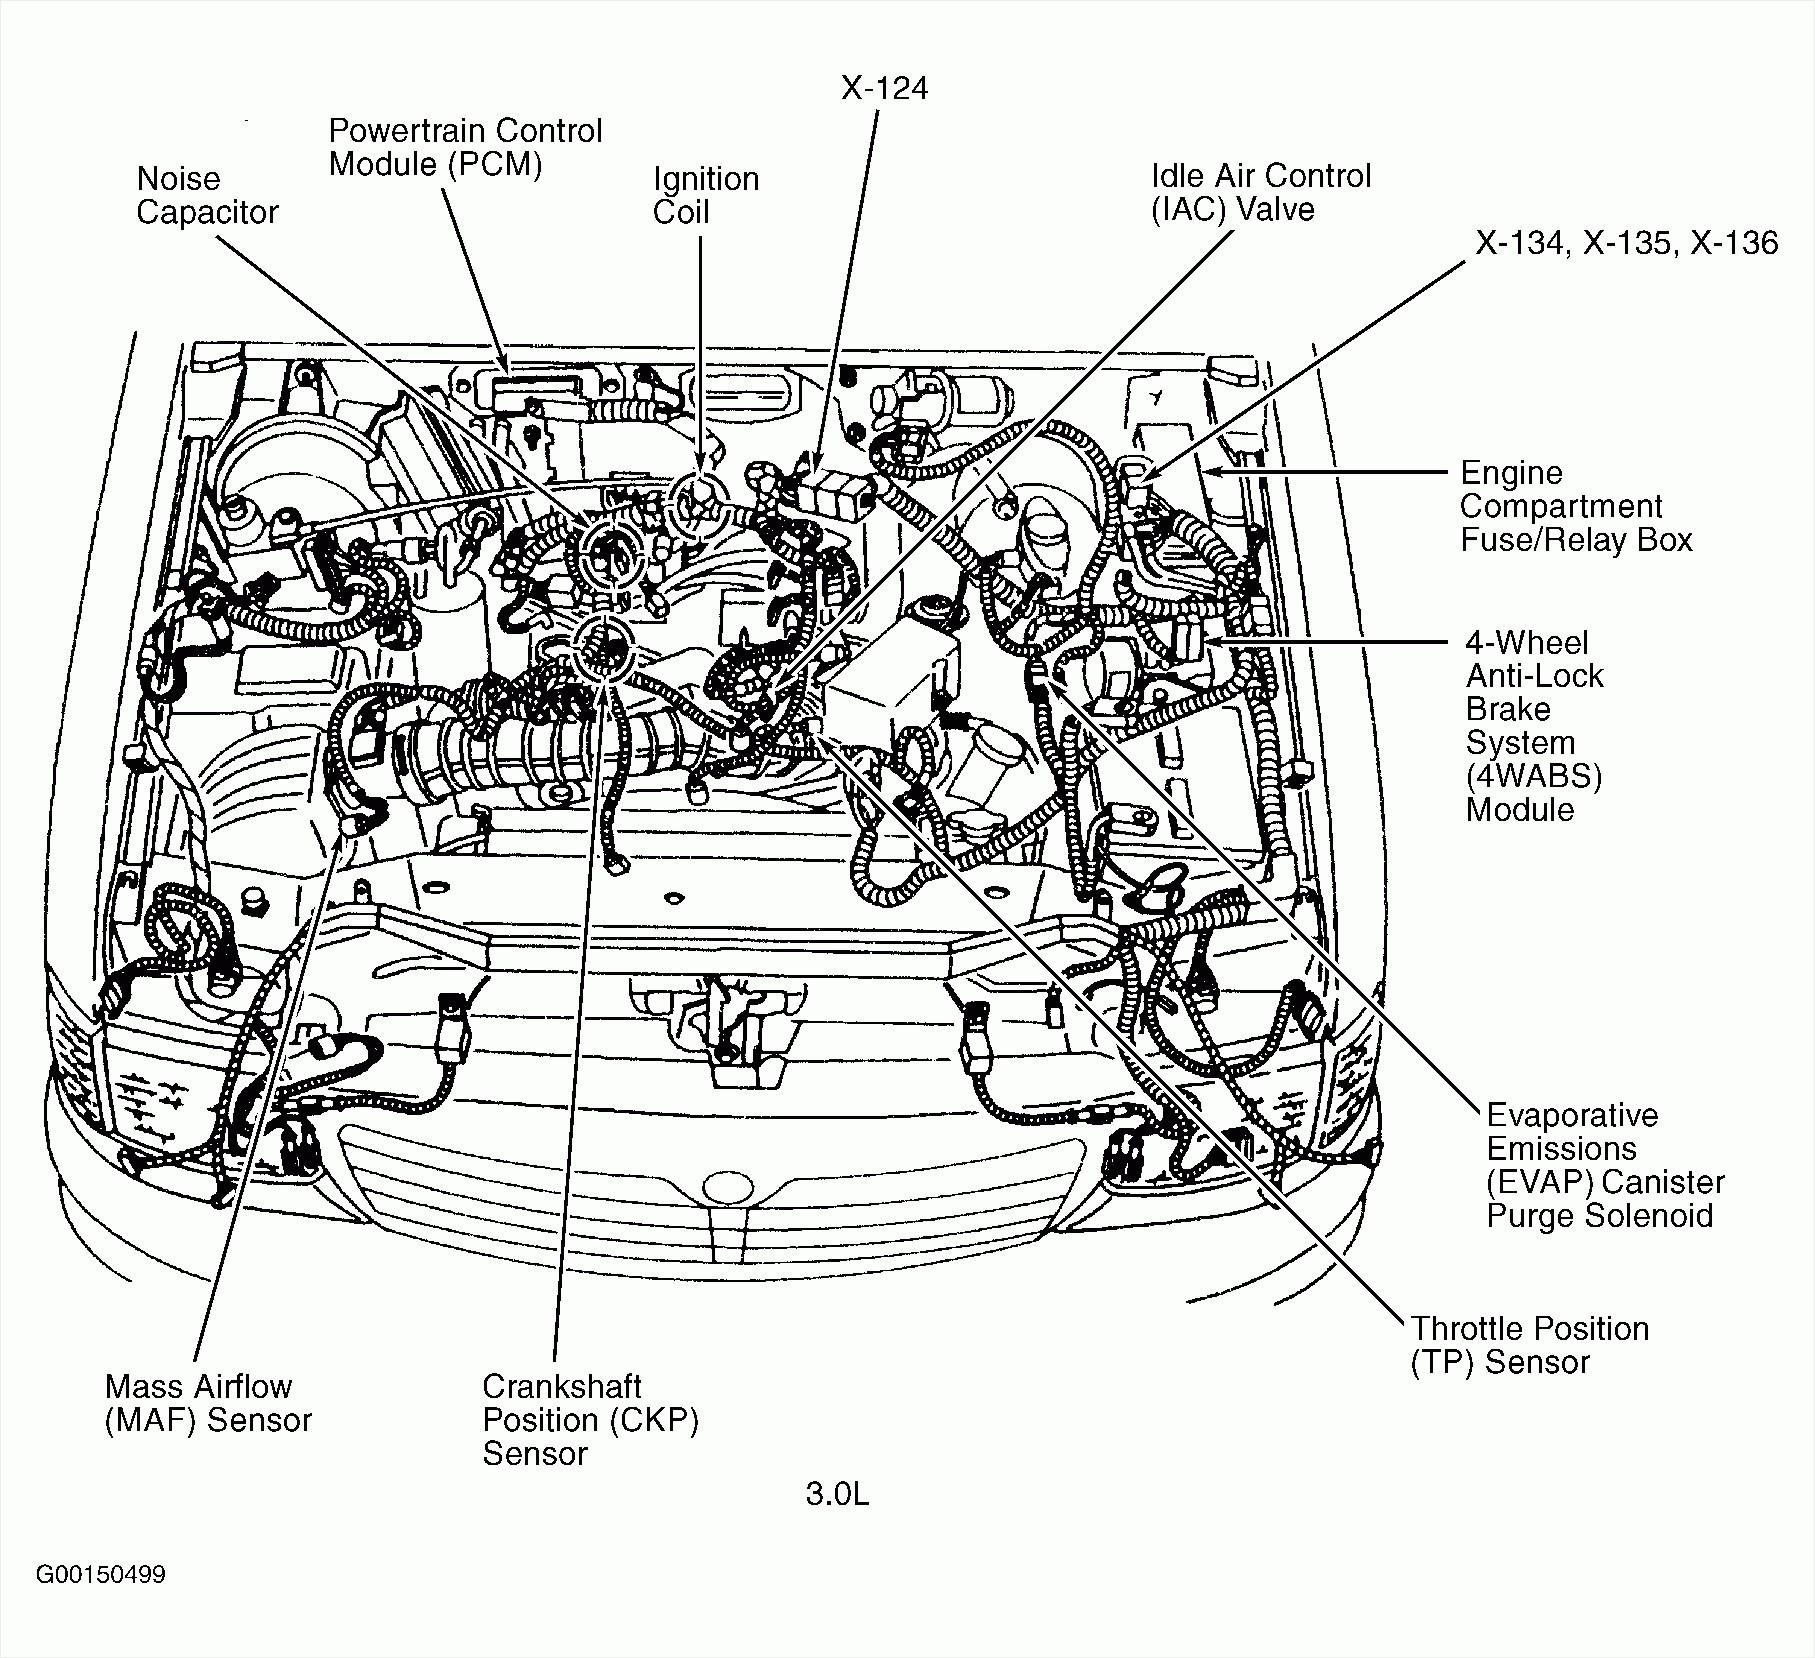 2003 Pontiac Grand Prix Engine Diagram Diagram Furthermore ... on pontiac aztek horn, pontiac aztek wiring system, pontiac aztek concept, pontiac aztek oil filter, pontiac vibe wiring diagram, pontiac aztek power steering, pontiac 3 8 engine diagram, pontiac aztek sensor, pontiac aztek transmission diagram, pontiac aztek fuse diagram, pontiac aztek exhaust, pontiac trans sport wiring diagram, pontiac aztek serpentine belt diagram, pontiac aztek repair guide, pontiac aztek toyota, pontiac aztek water pump, pontiac aztek firing order, pontiac aztek transformer, pontiac fiero wiring diagram, pontiac aztek ignition,